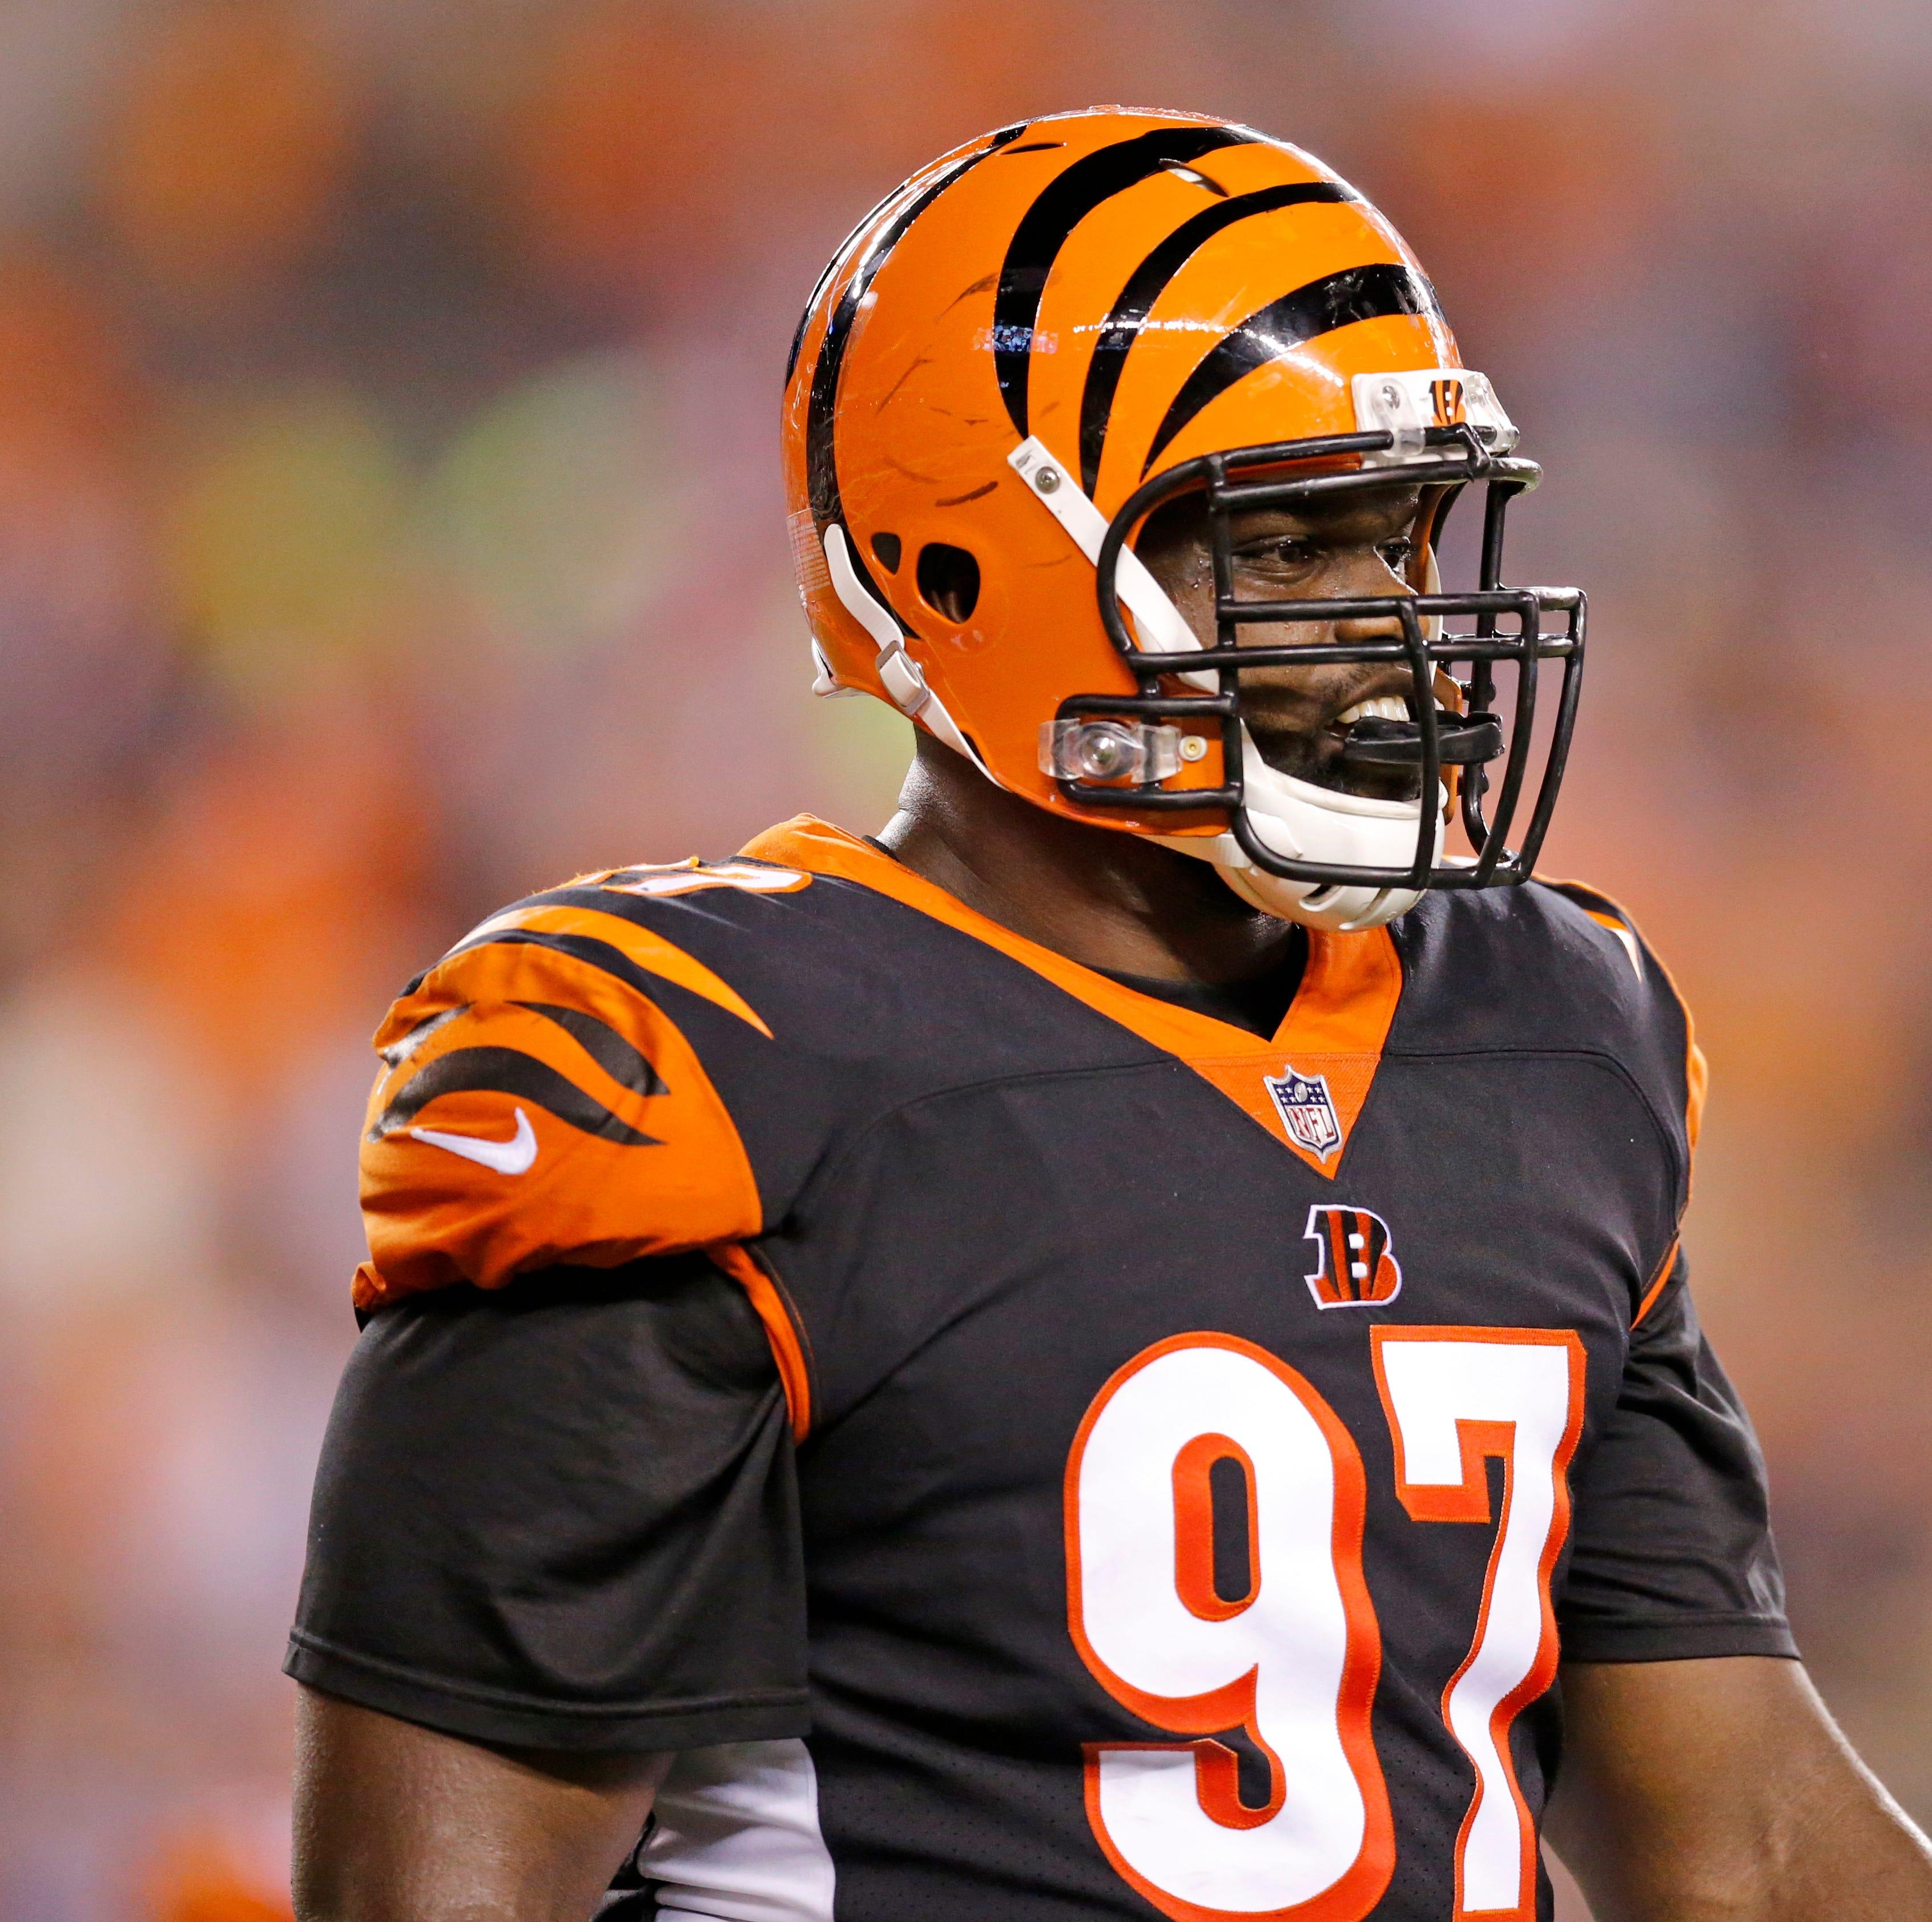 Cincinnati Bengals defensive tackle Geno Atkins...